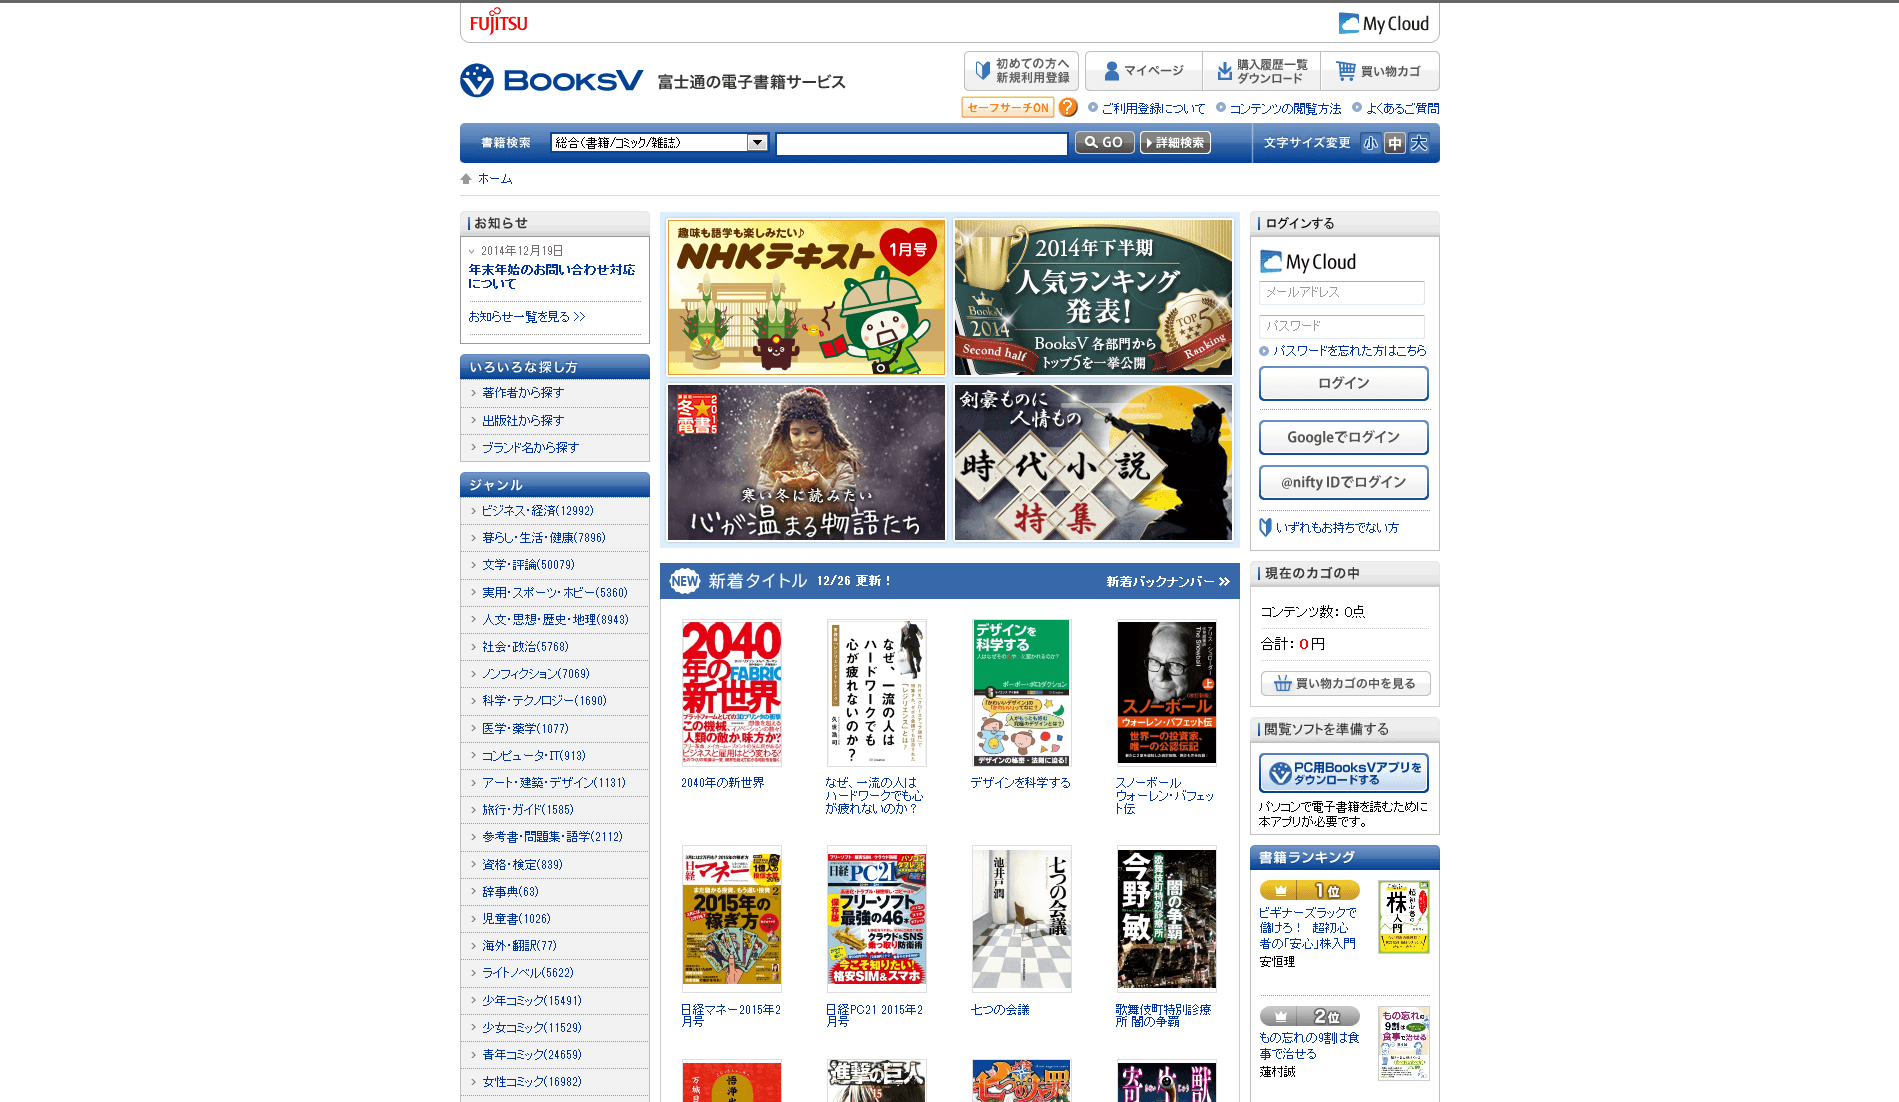 BooksV(ブックスブイ)|富士通の電子書籍サービス